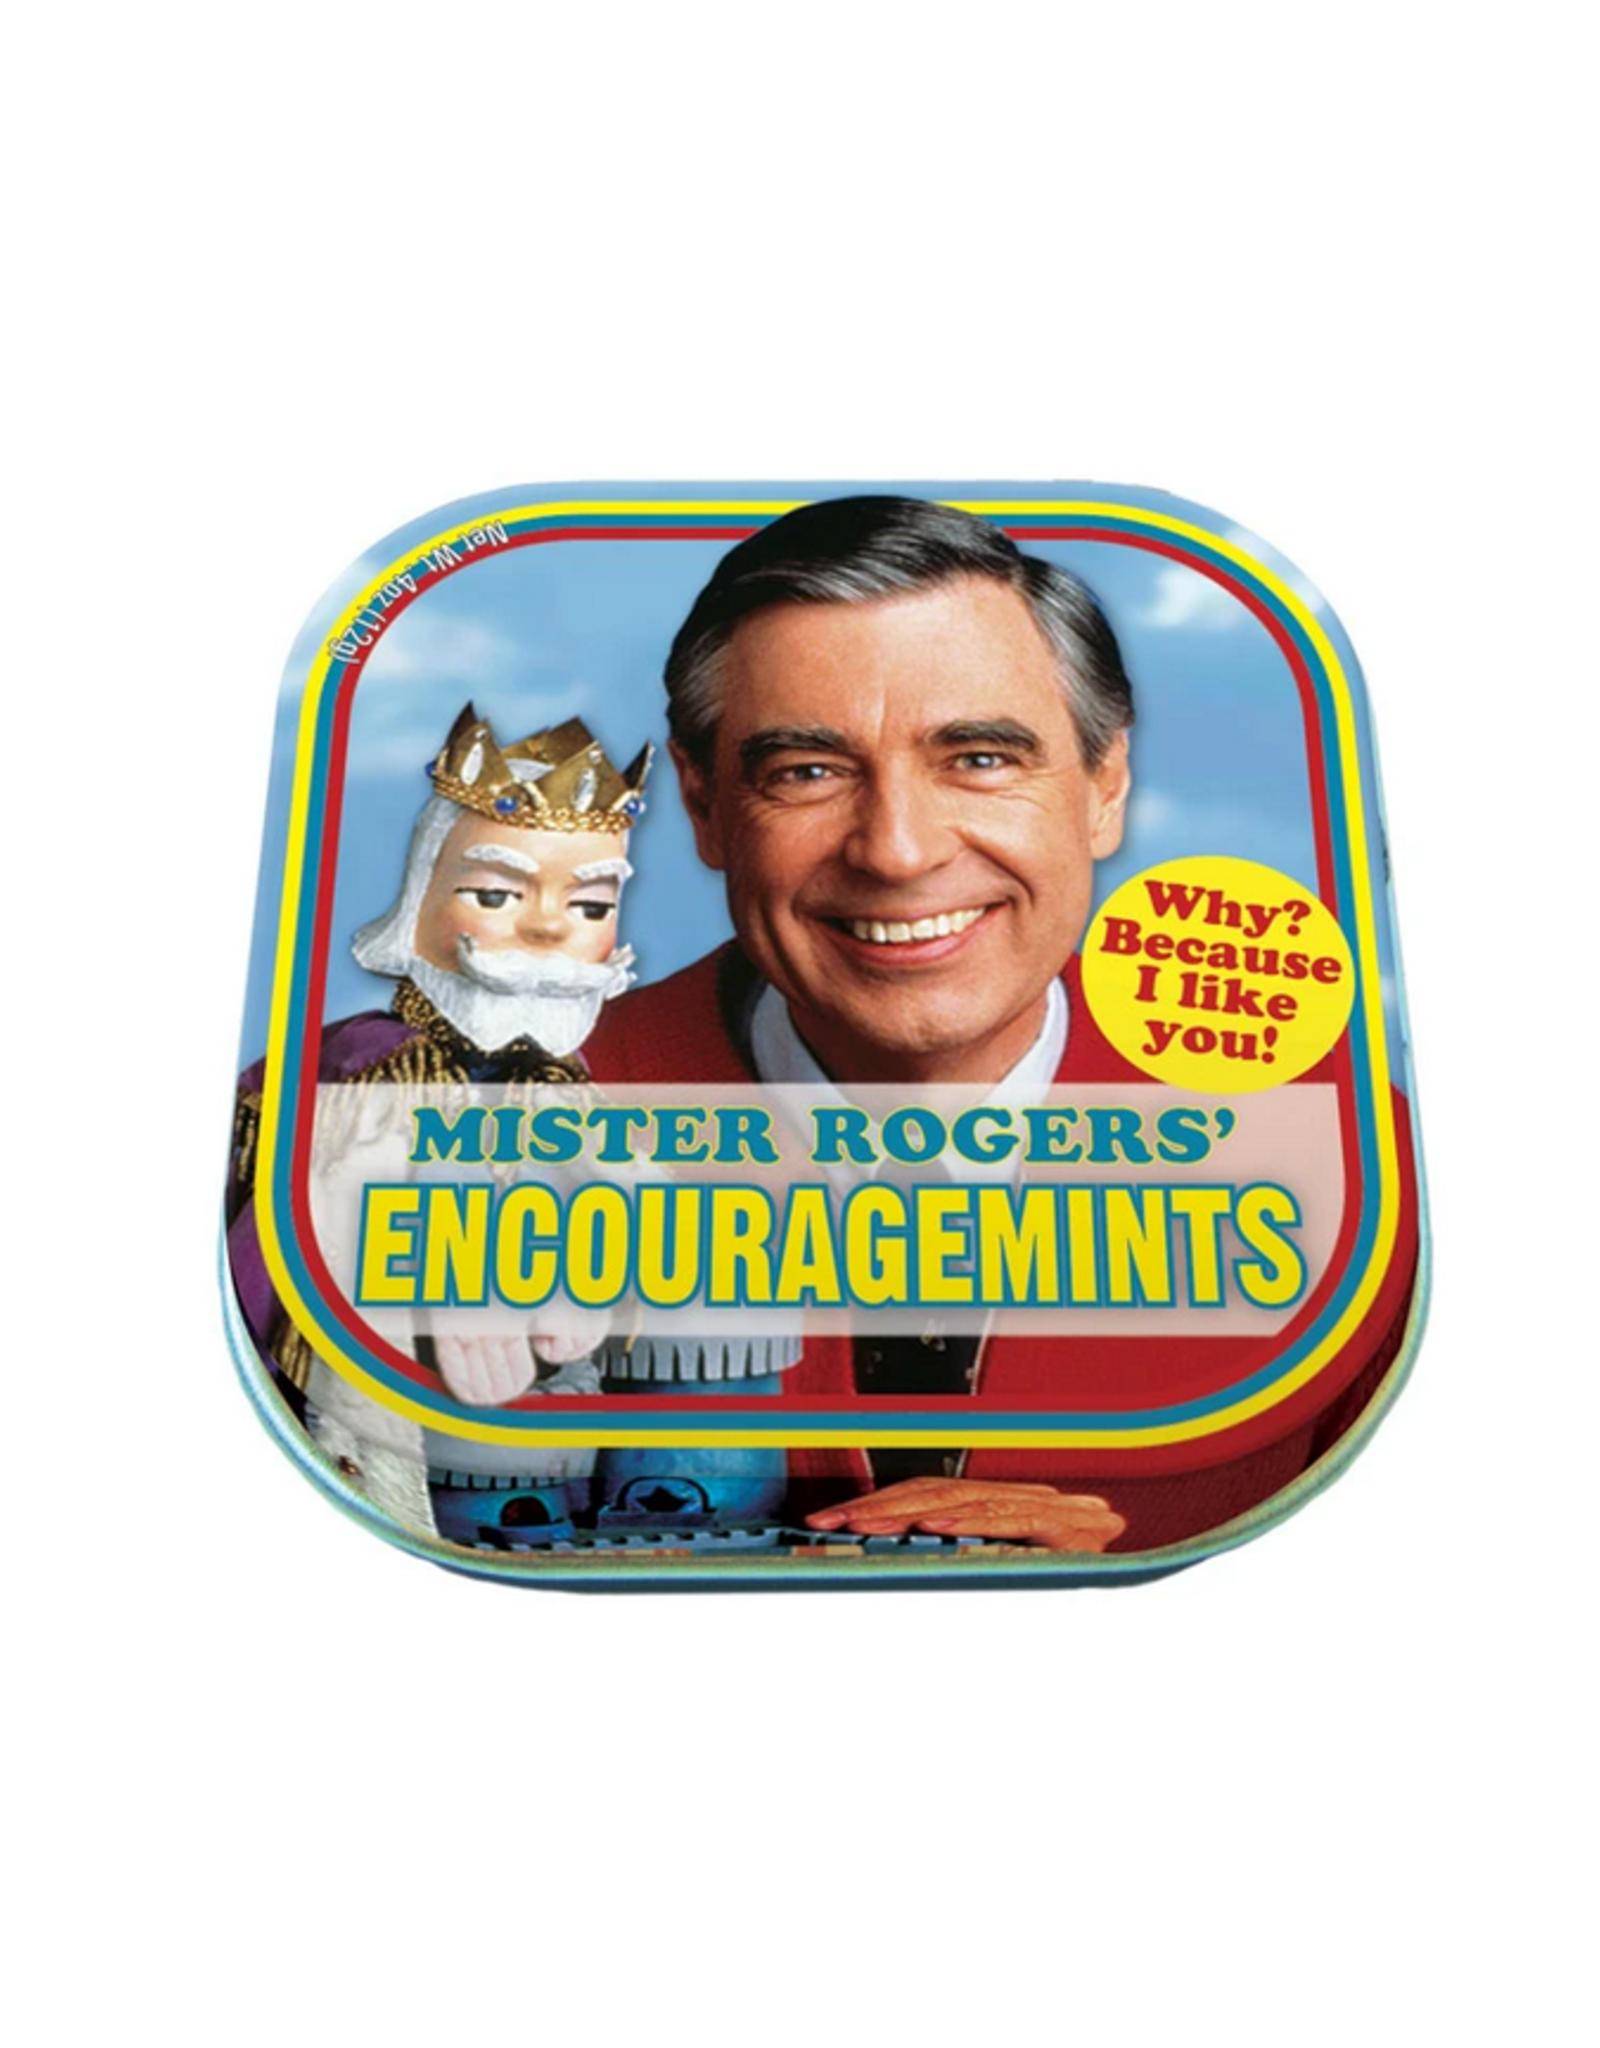 The Unemployed Philosopher's Guild Encouragemints Mister Rogers